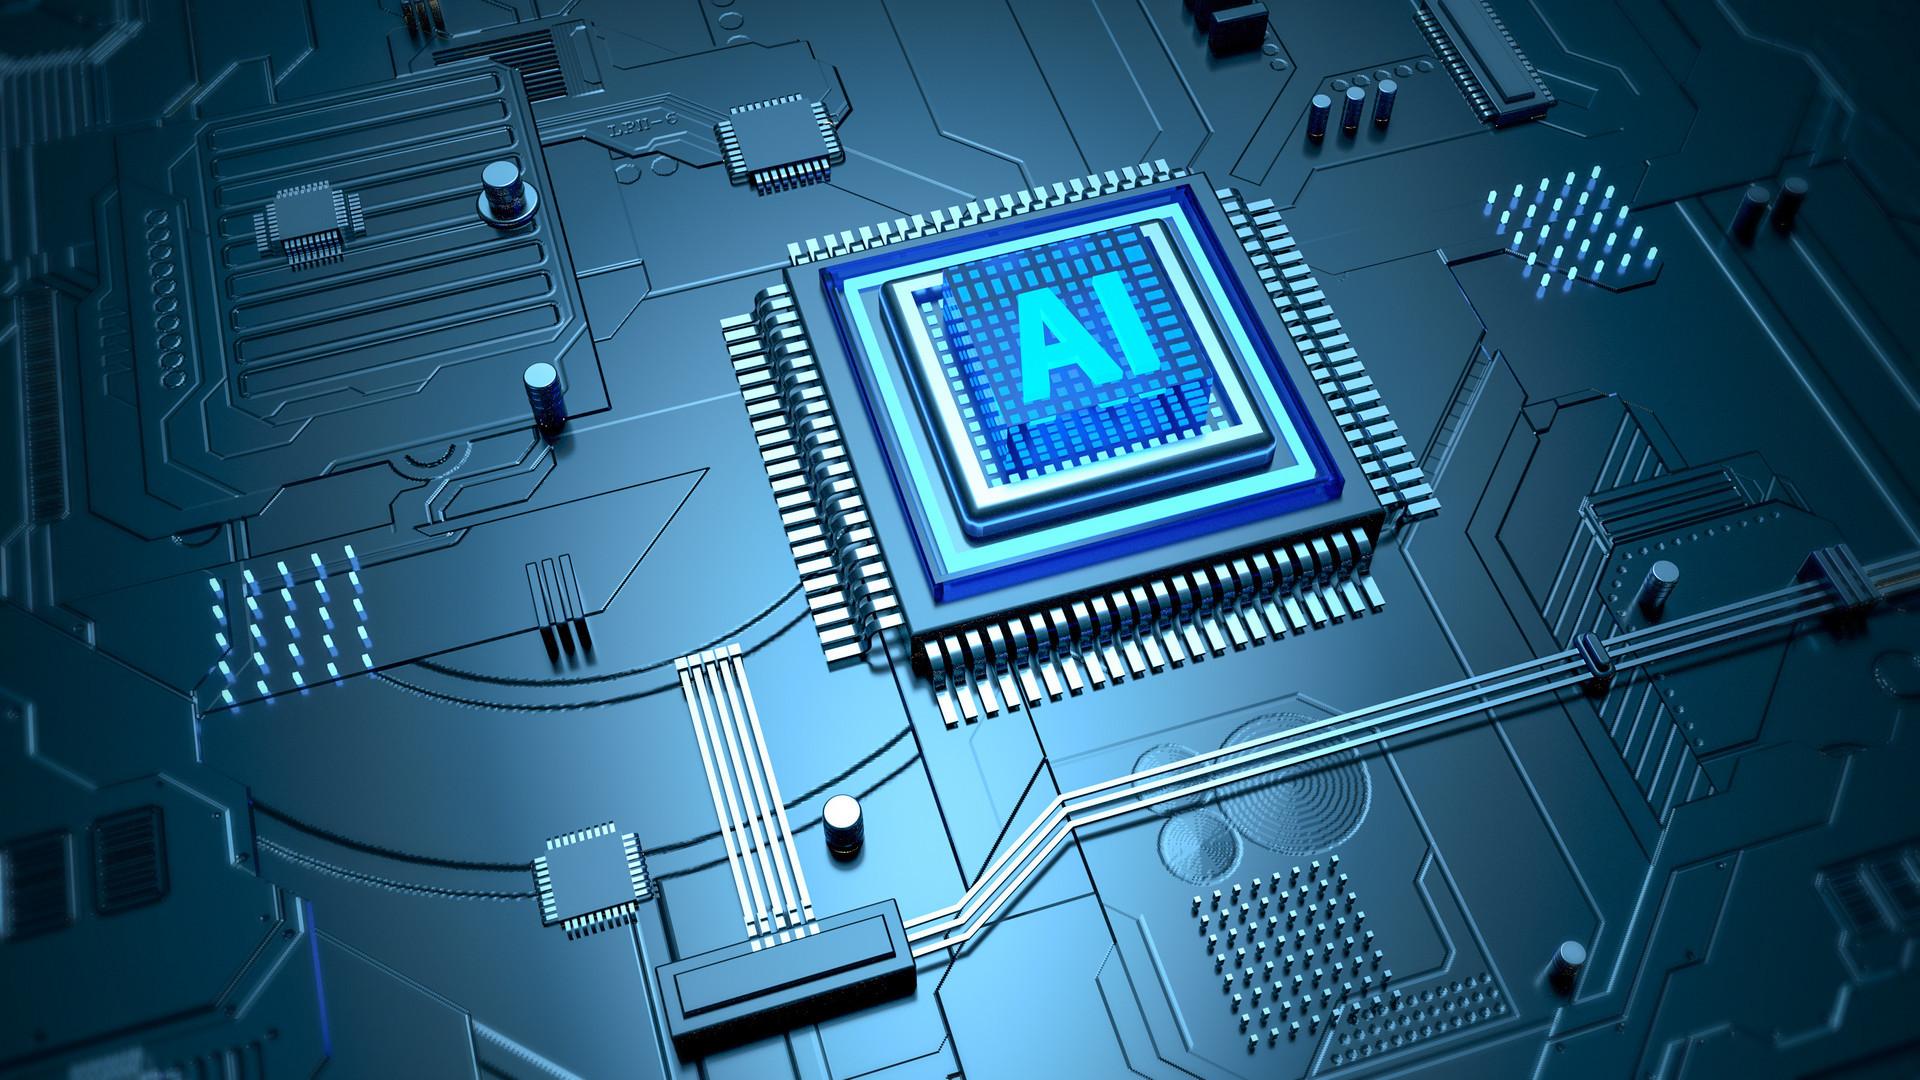 5G已经OUT,6G+AI才是未来   _中欧新闻_欧洲中文网